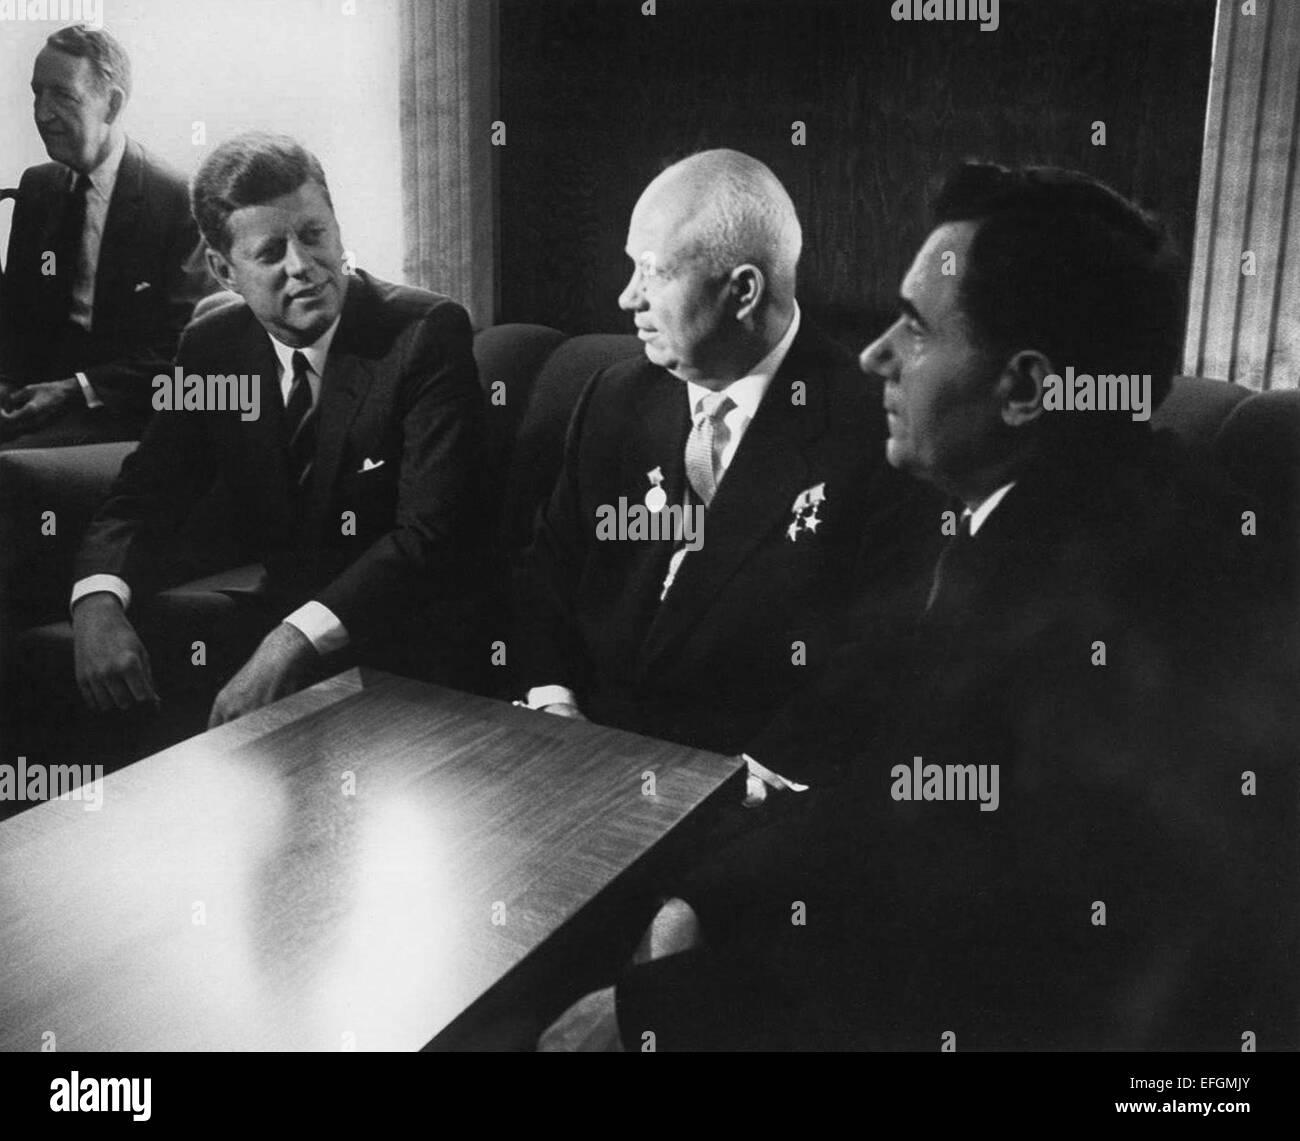 US President John F. Kennedy meets with Soviet leader Nikita Khrushchev  prior to formal talks at the Vienna Summit - Stock Image